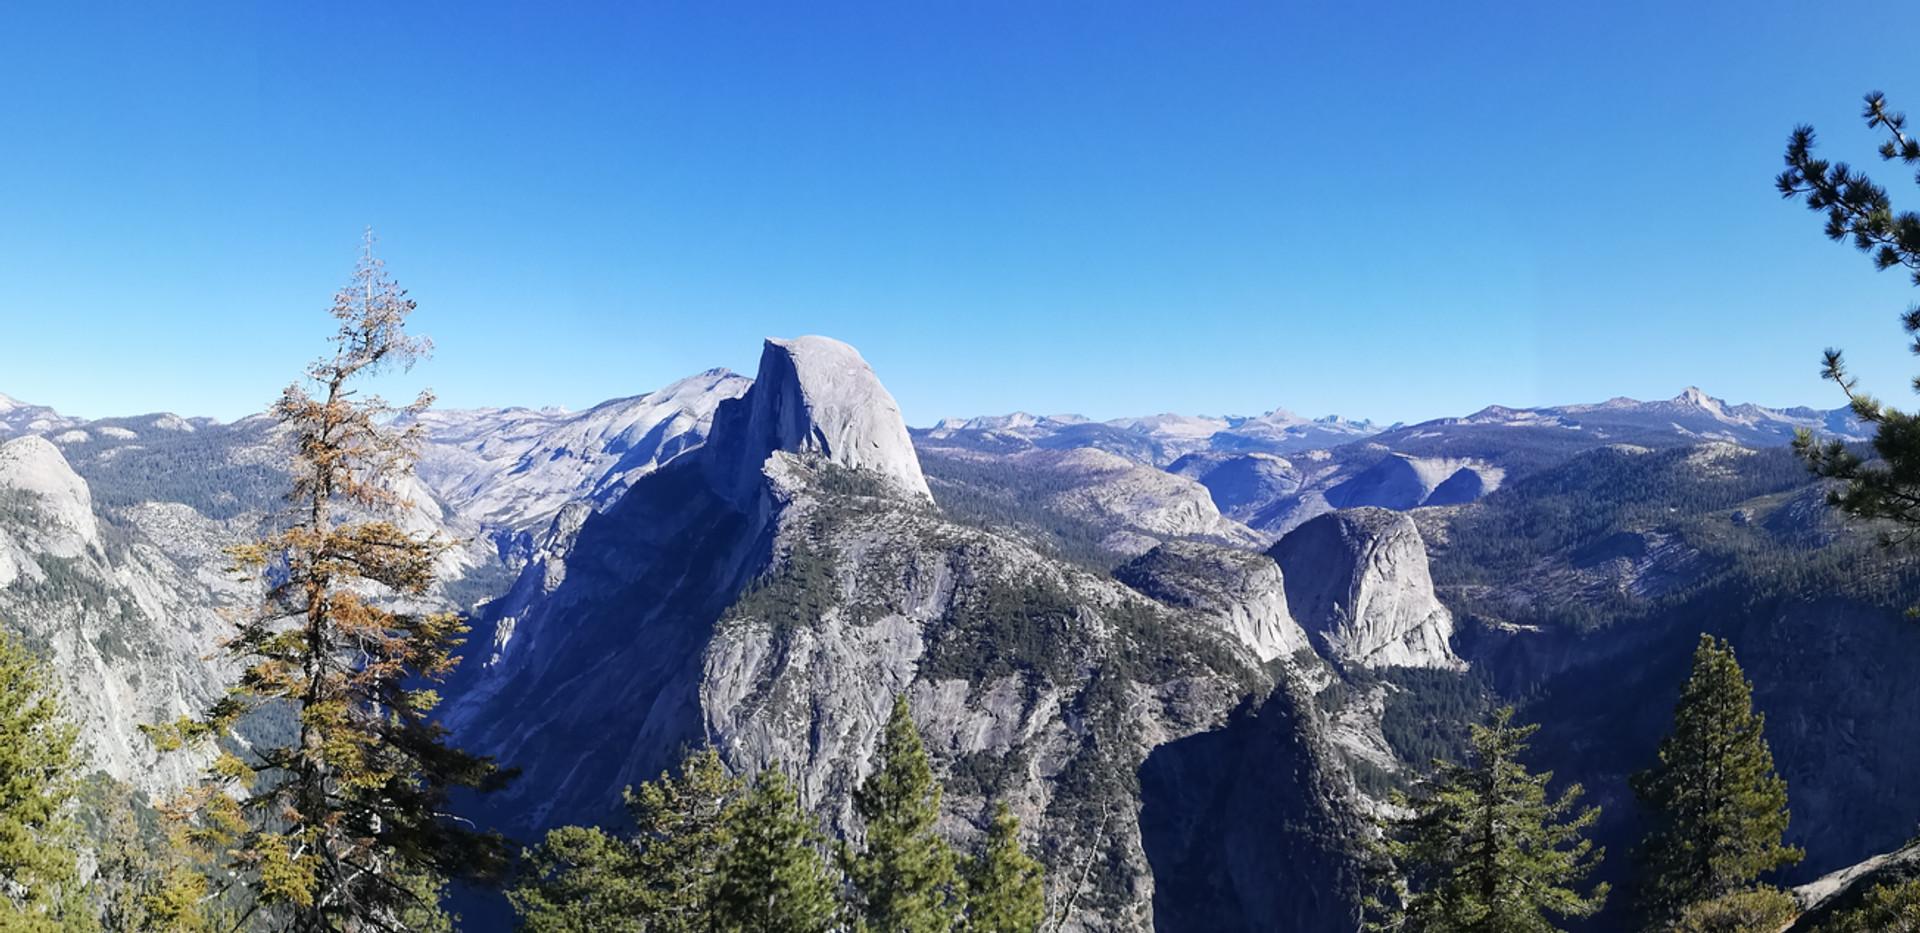 Half dome (Yosemite).jpg